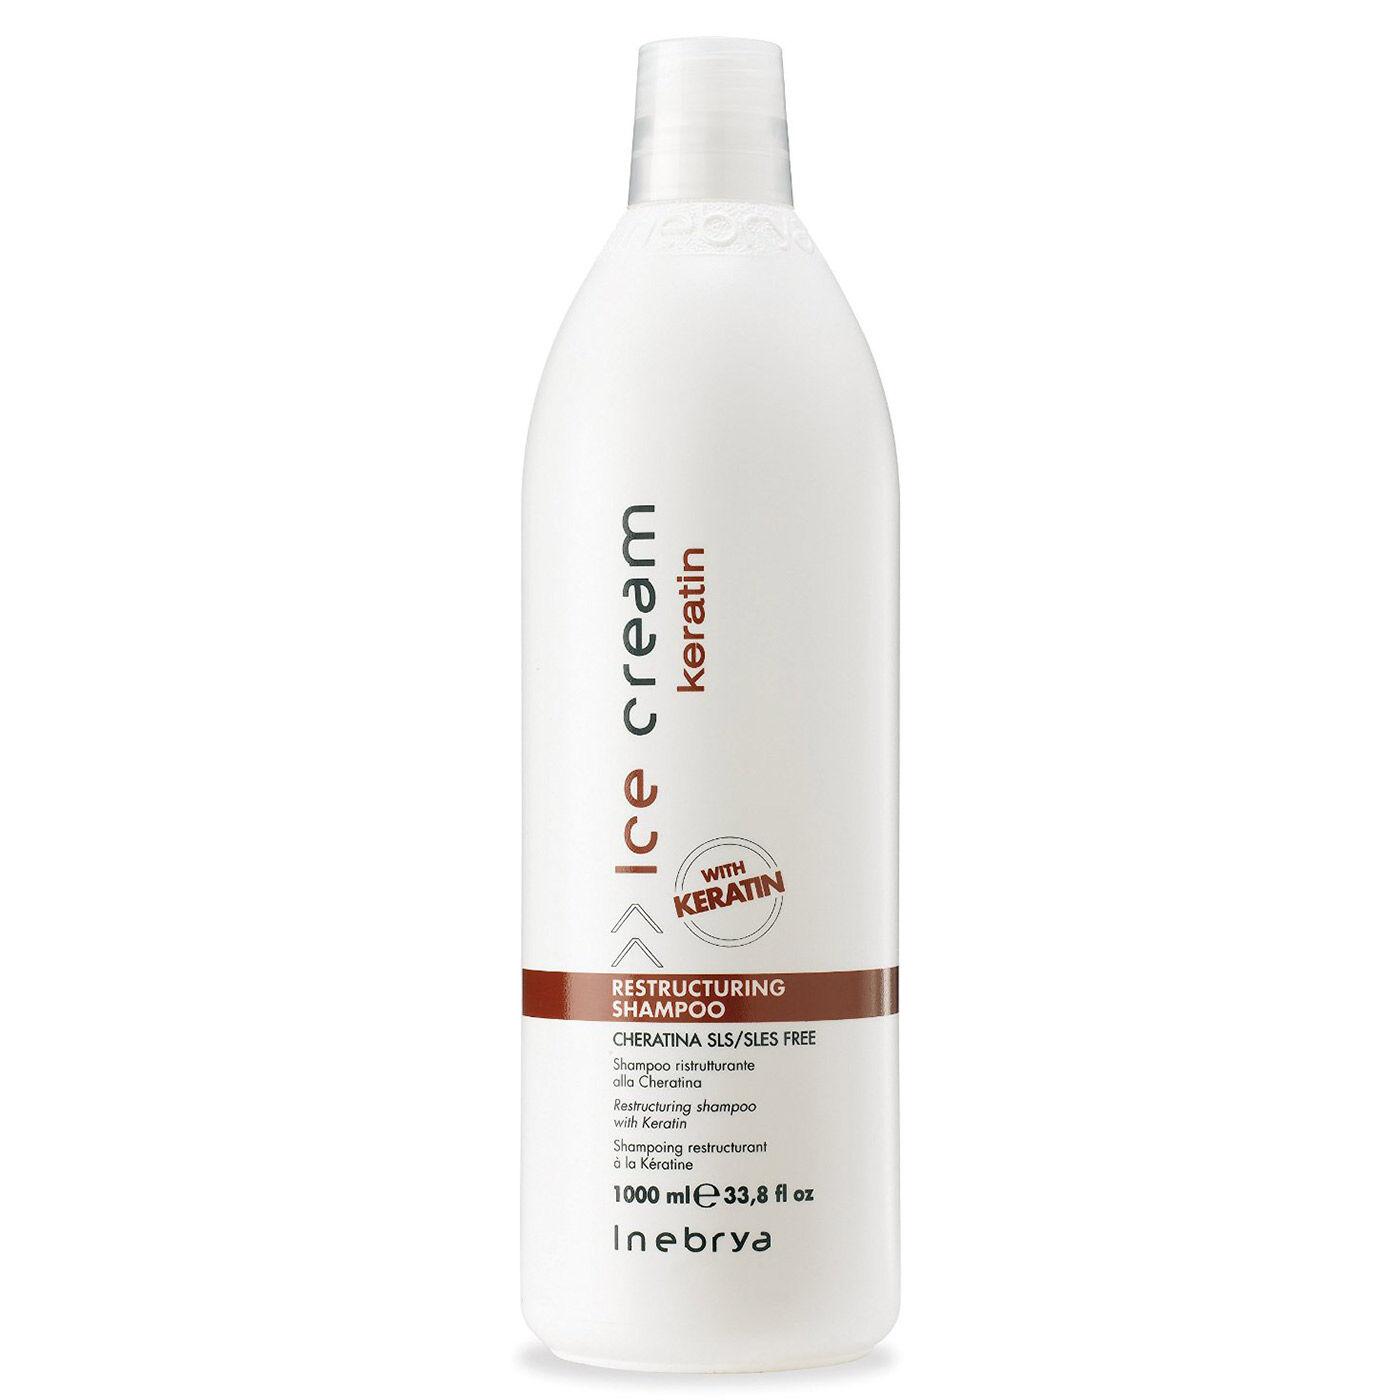 Inebrya - Shampoing Sans Sulfate - à la Kératine - 1000 ml